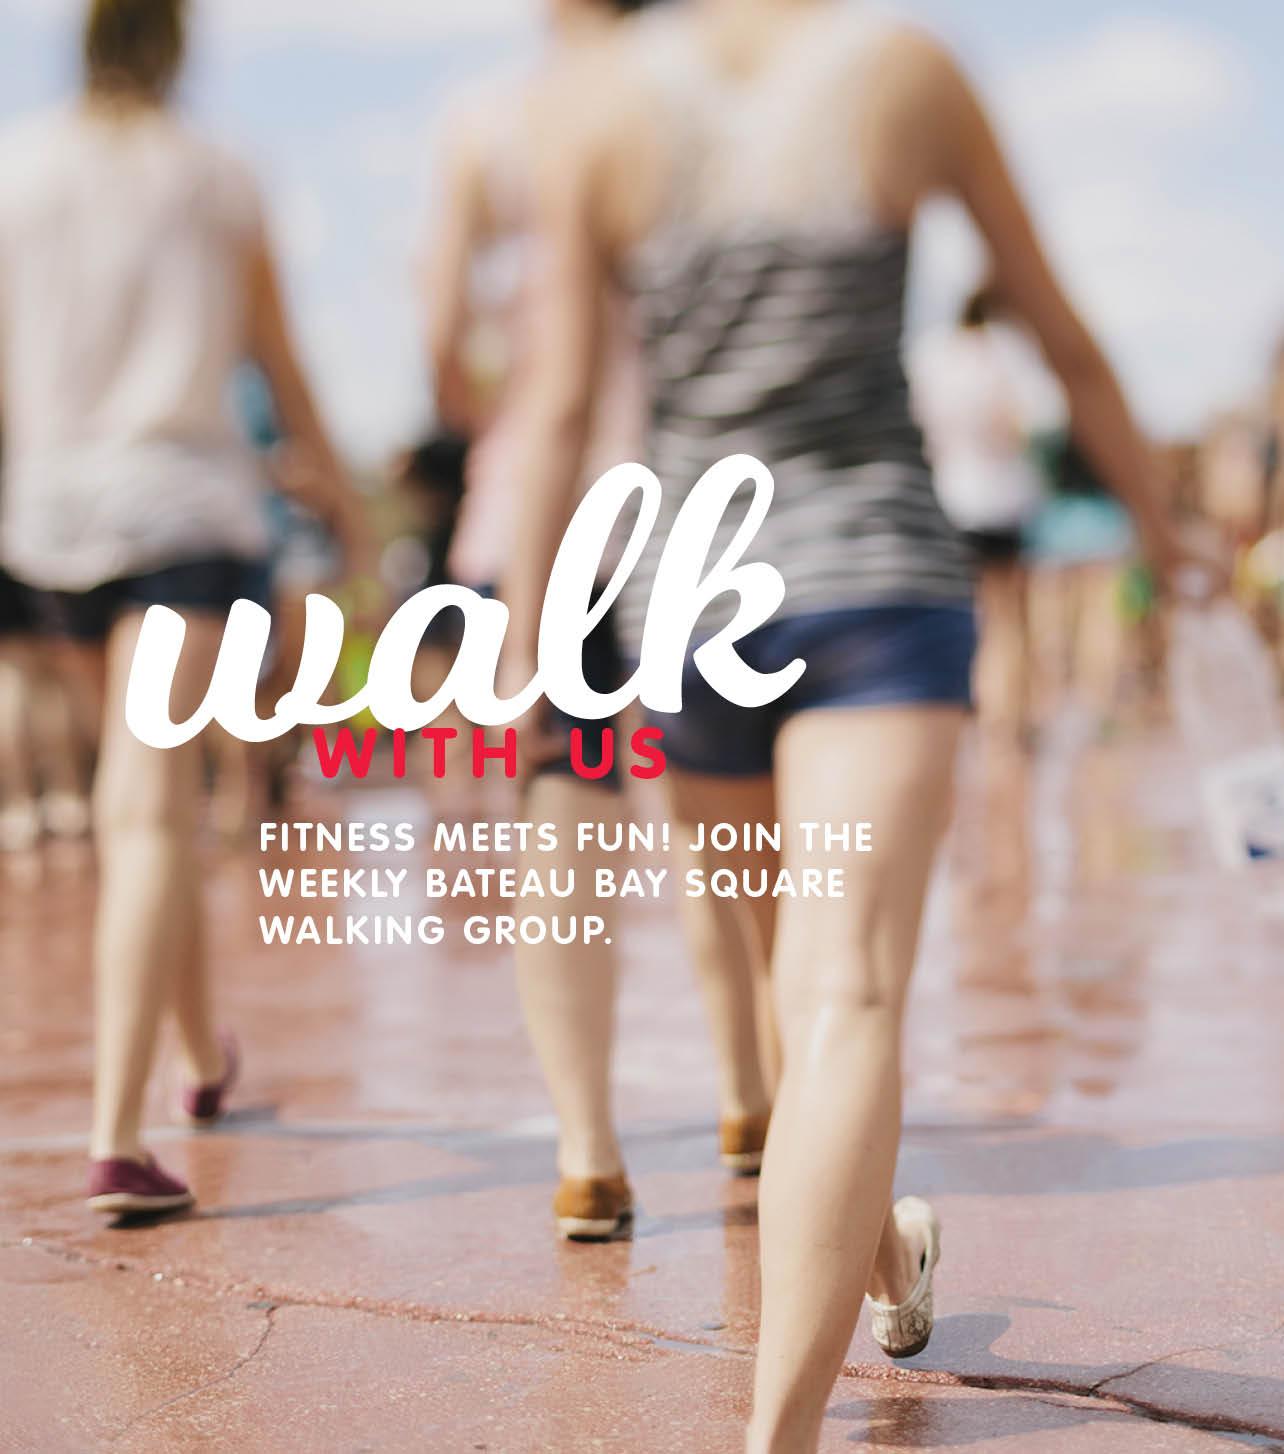 BB-LM_Web Content-642x727-@2x_Walk